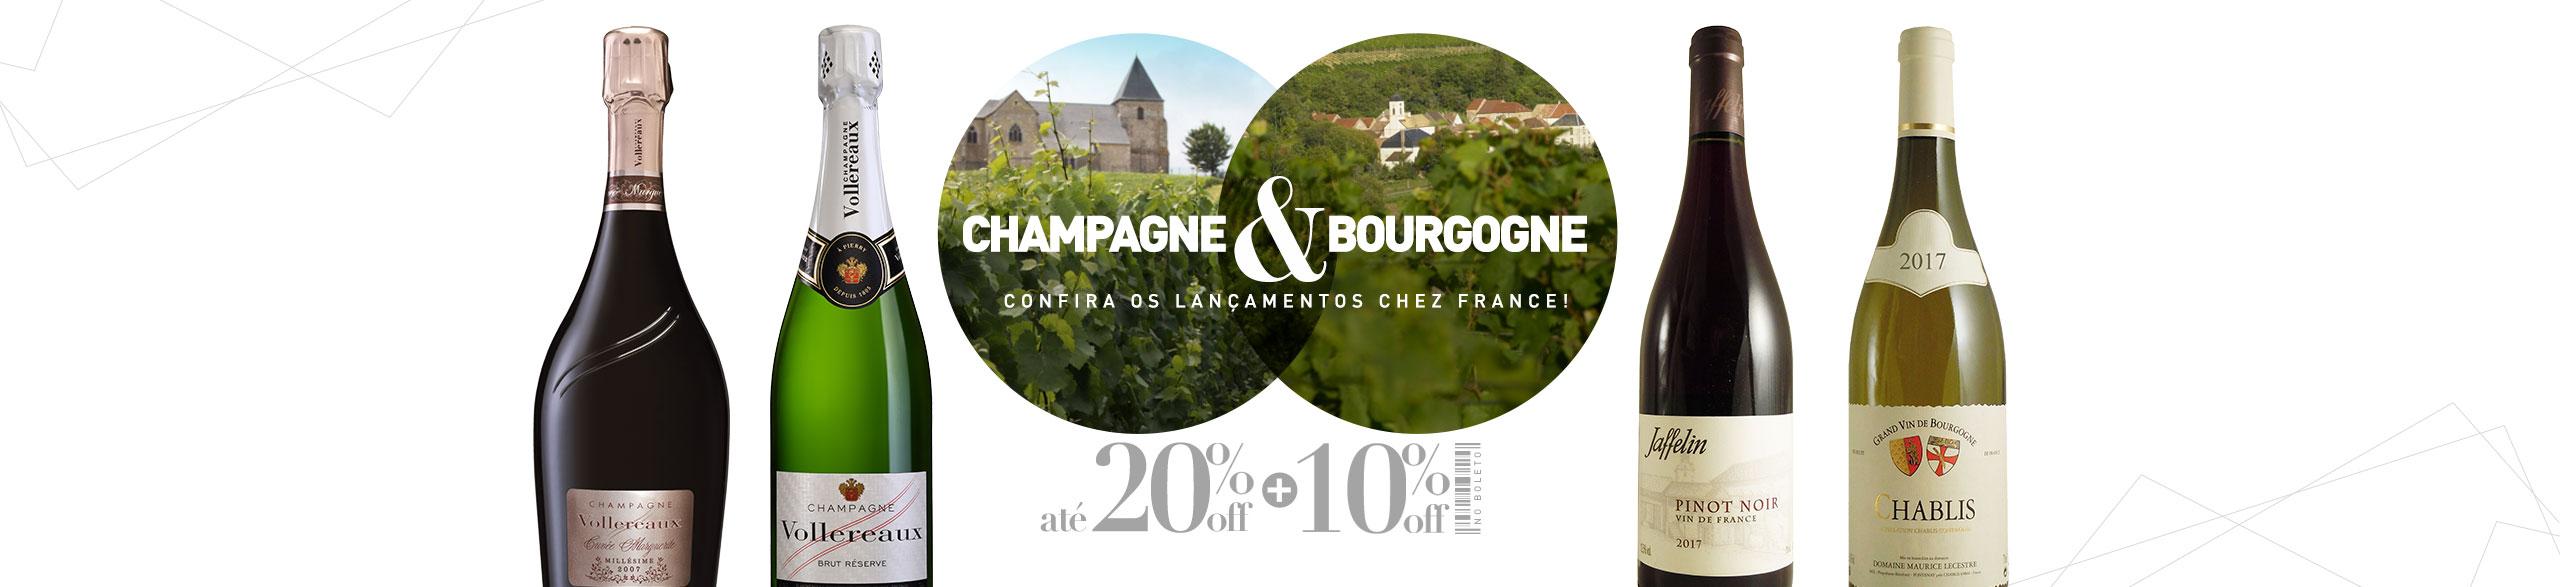 Champagne e Bourgogne